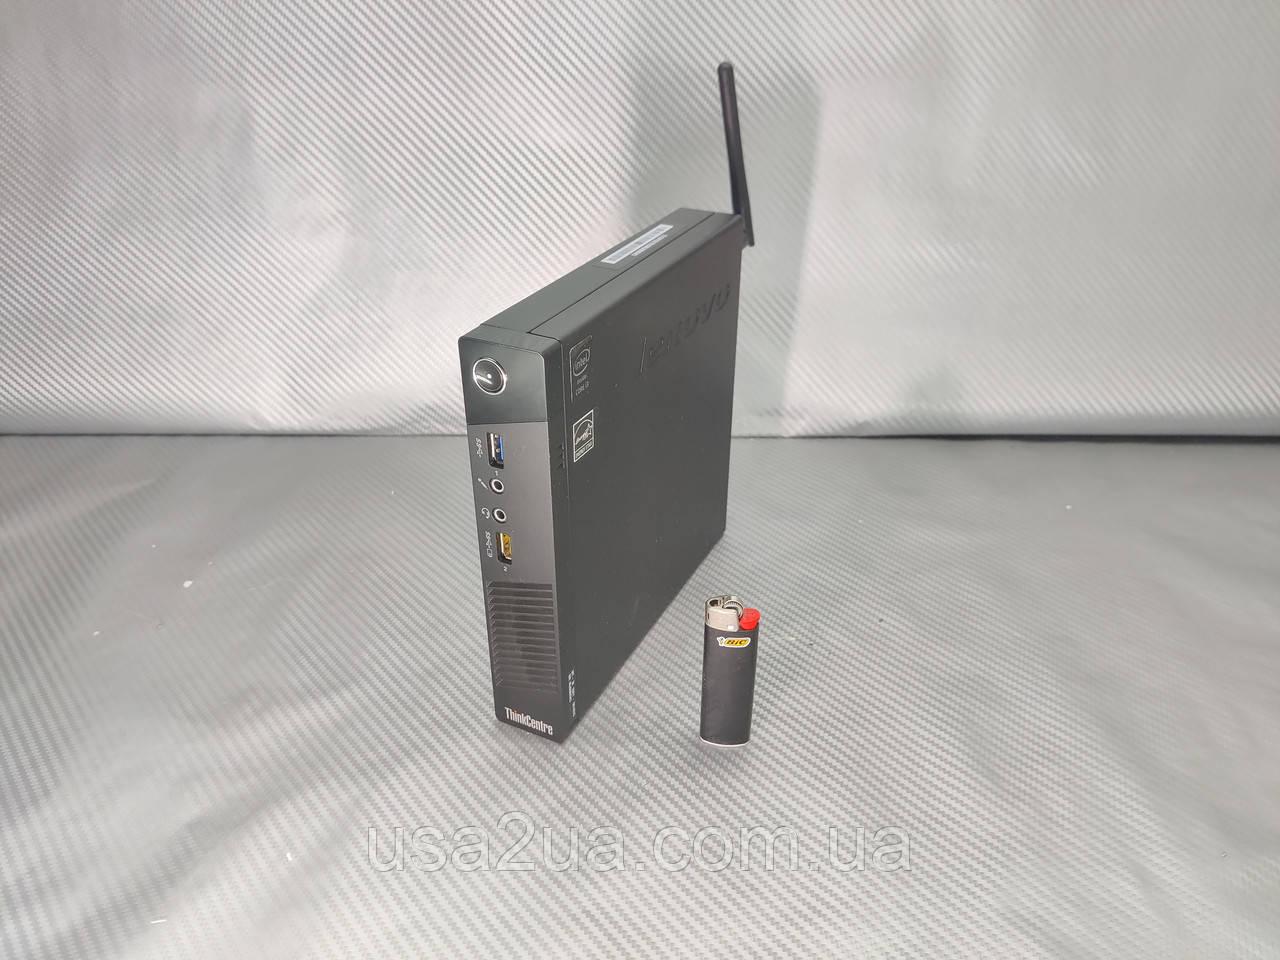 Компьютер системный блок Lenovo M73 Tiny Mini i3-4130T 3.1 ГГц 4 Гб 500 Гб 1.3 кг Wifi гарантия кредит